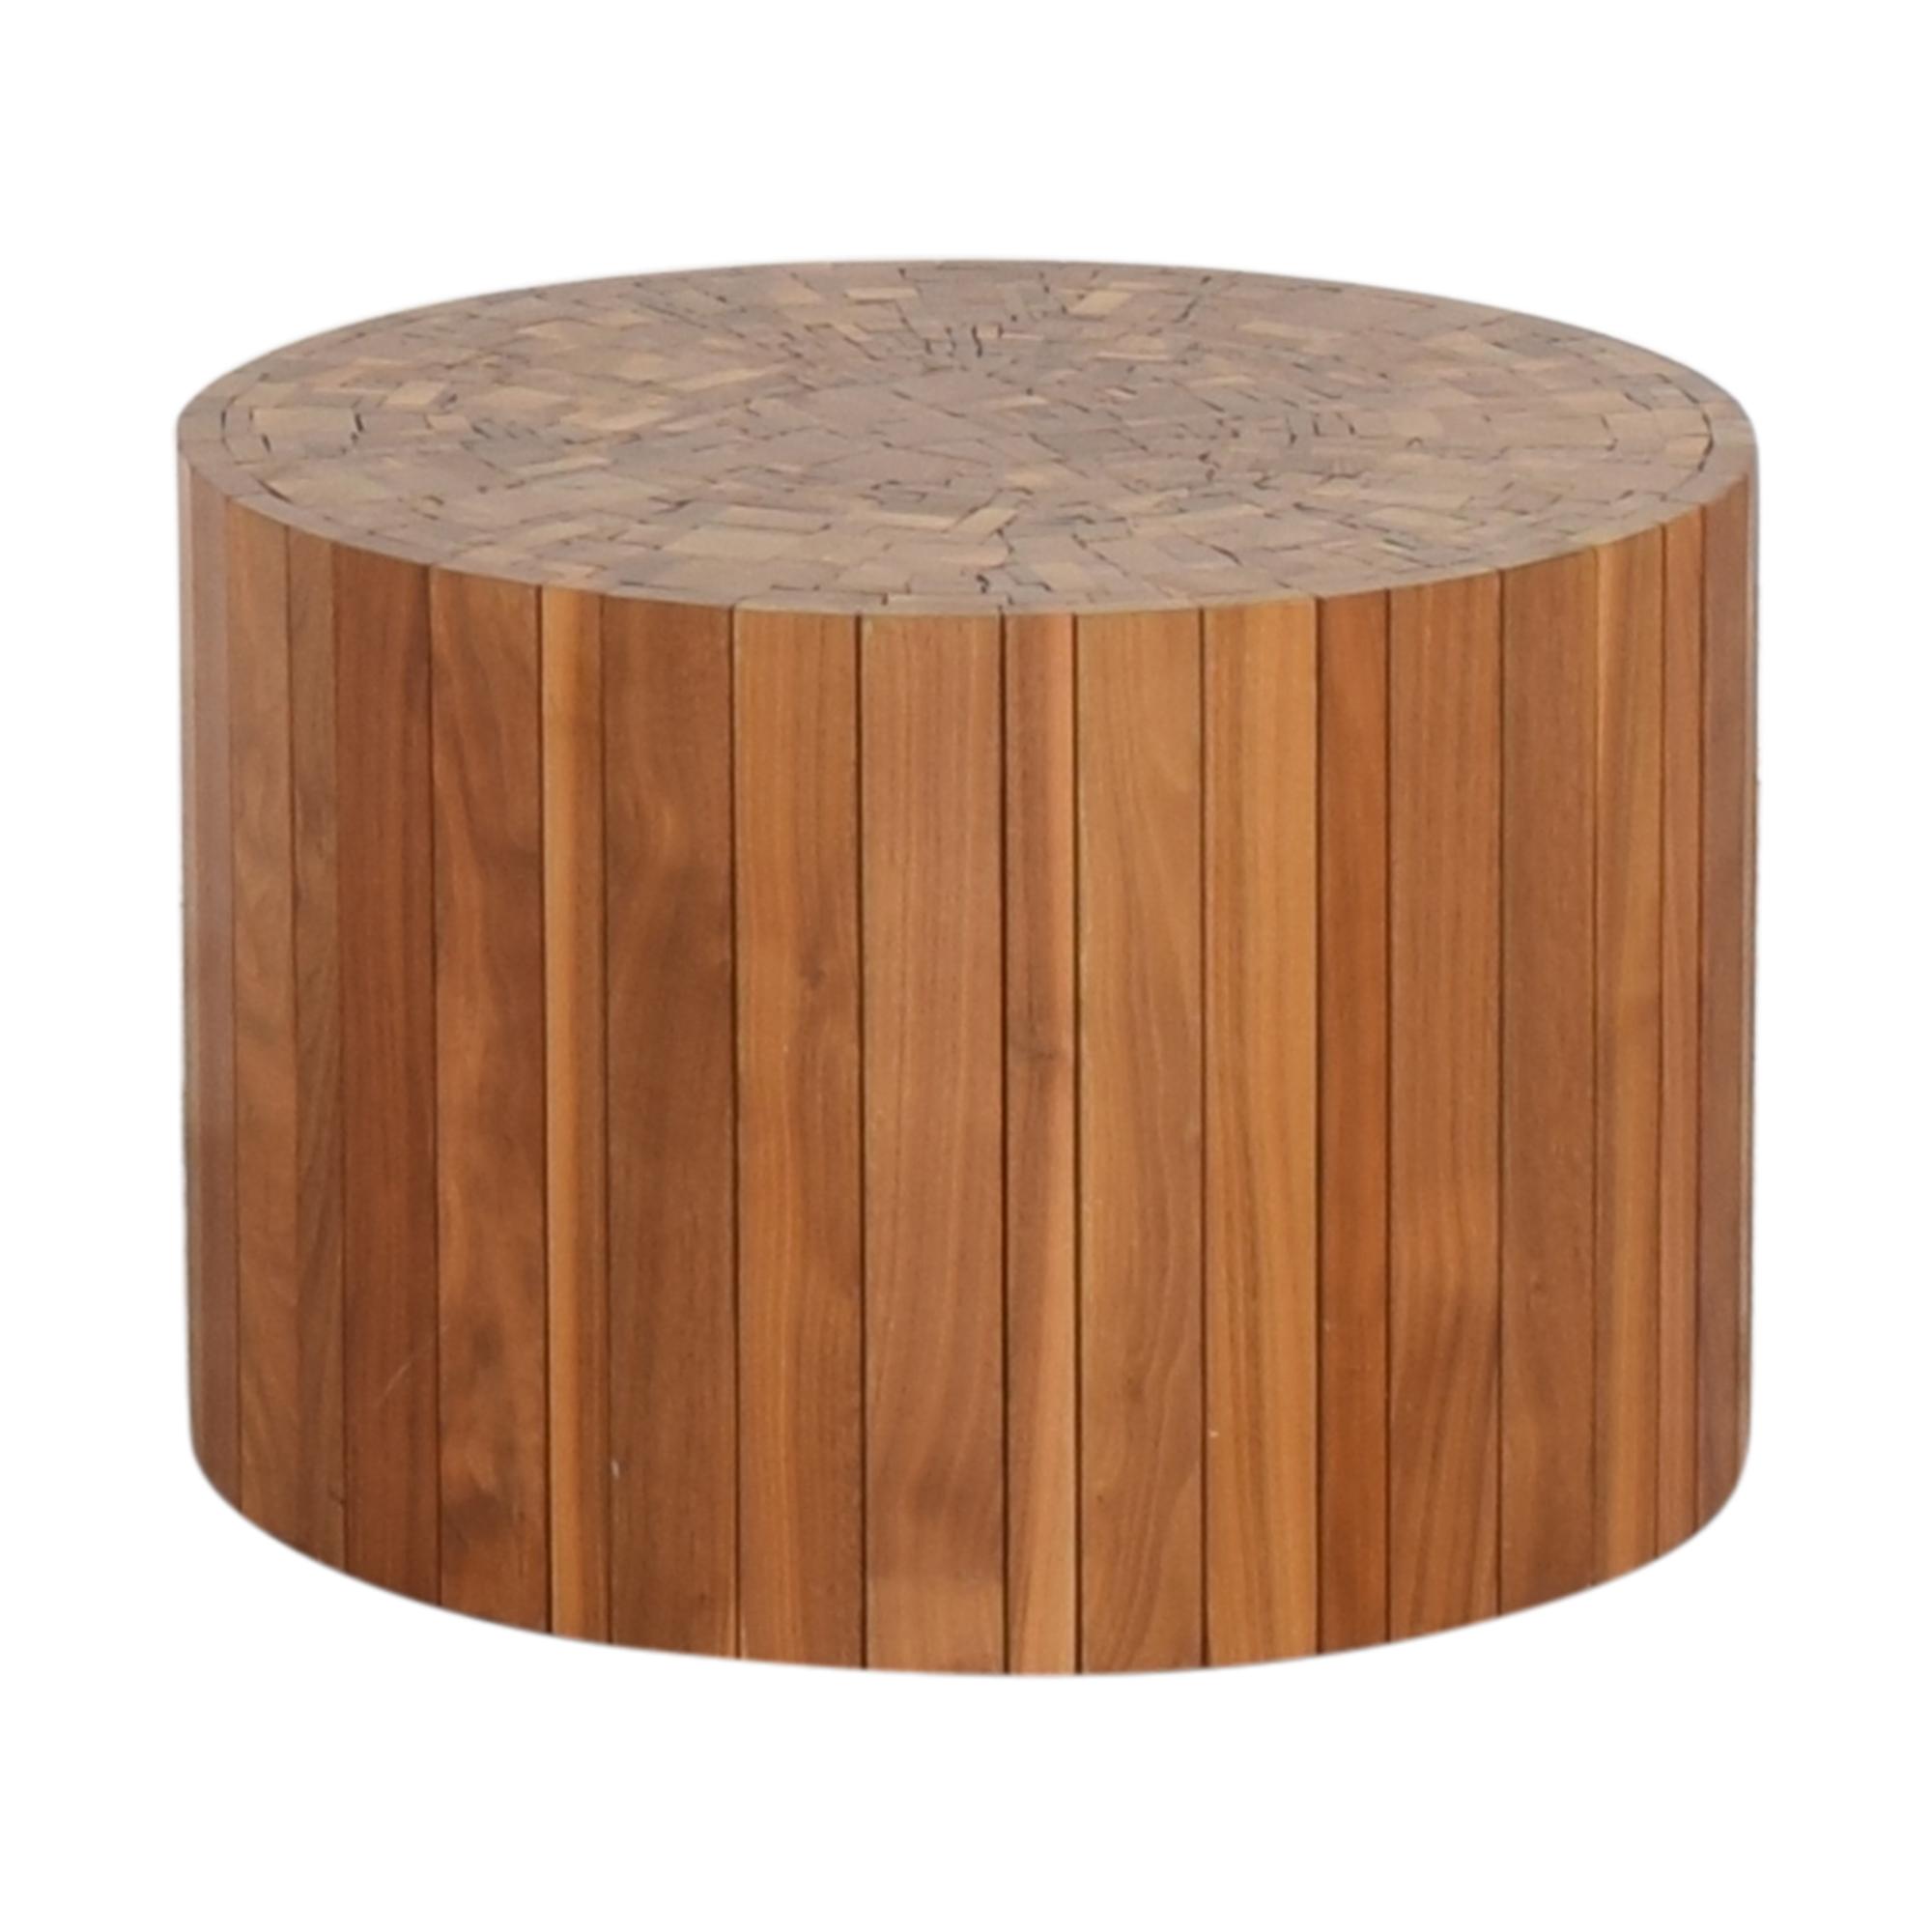 Uhuru Design Uhuru Design Stoolen Coffee Table brown